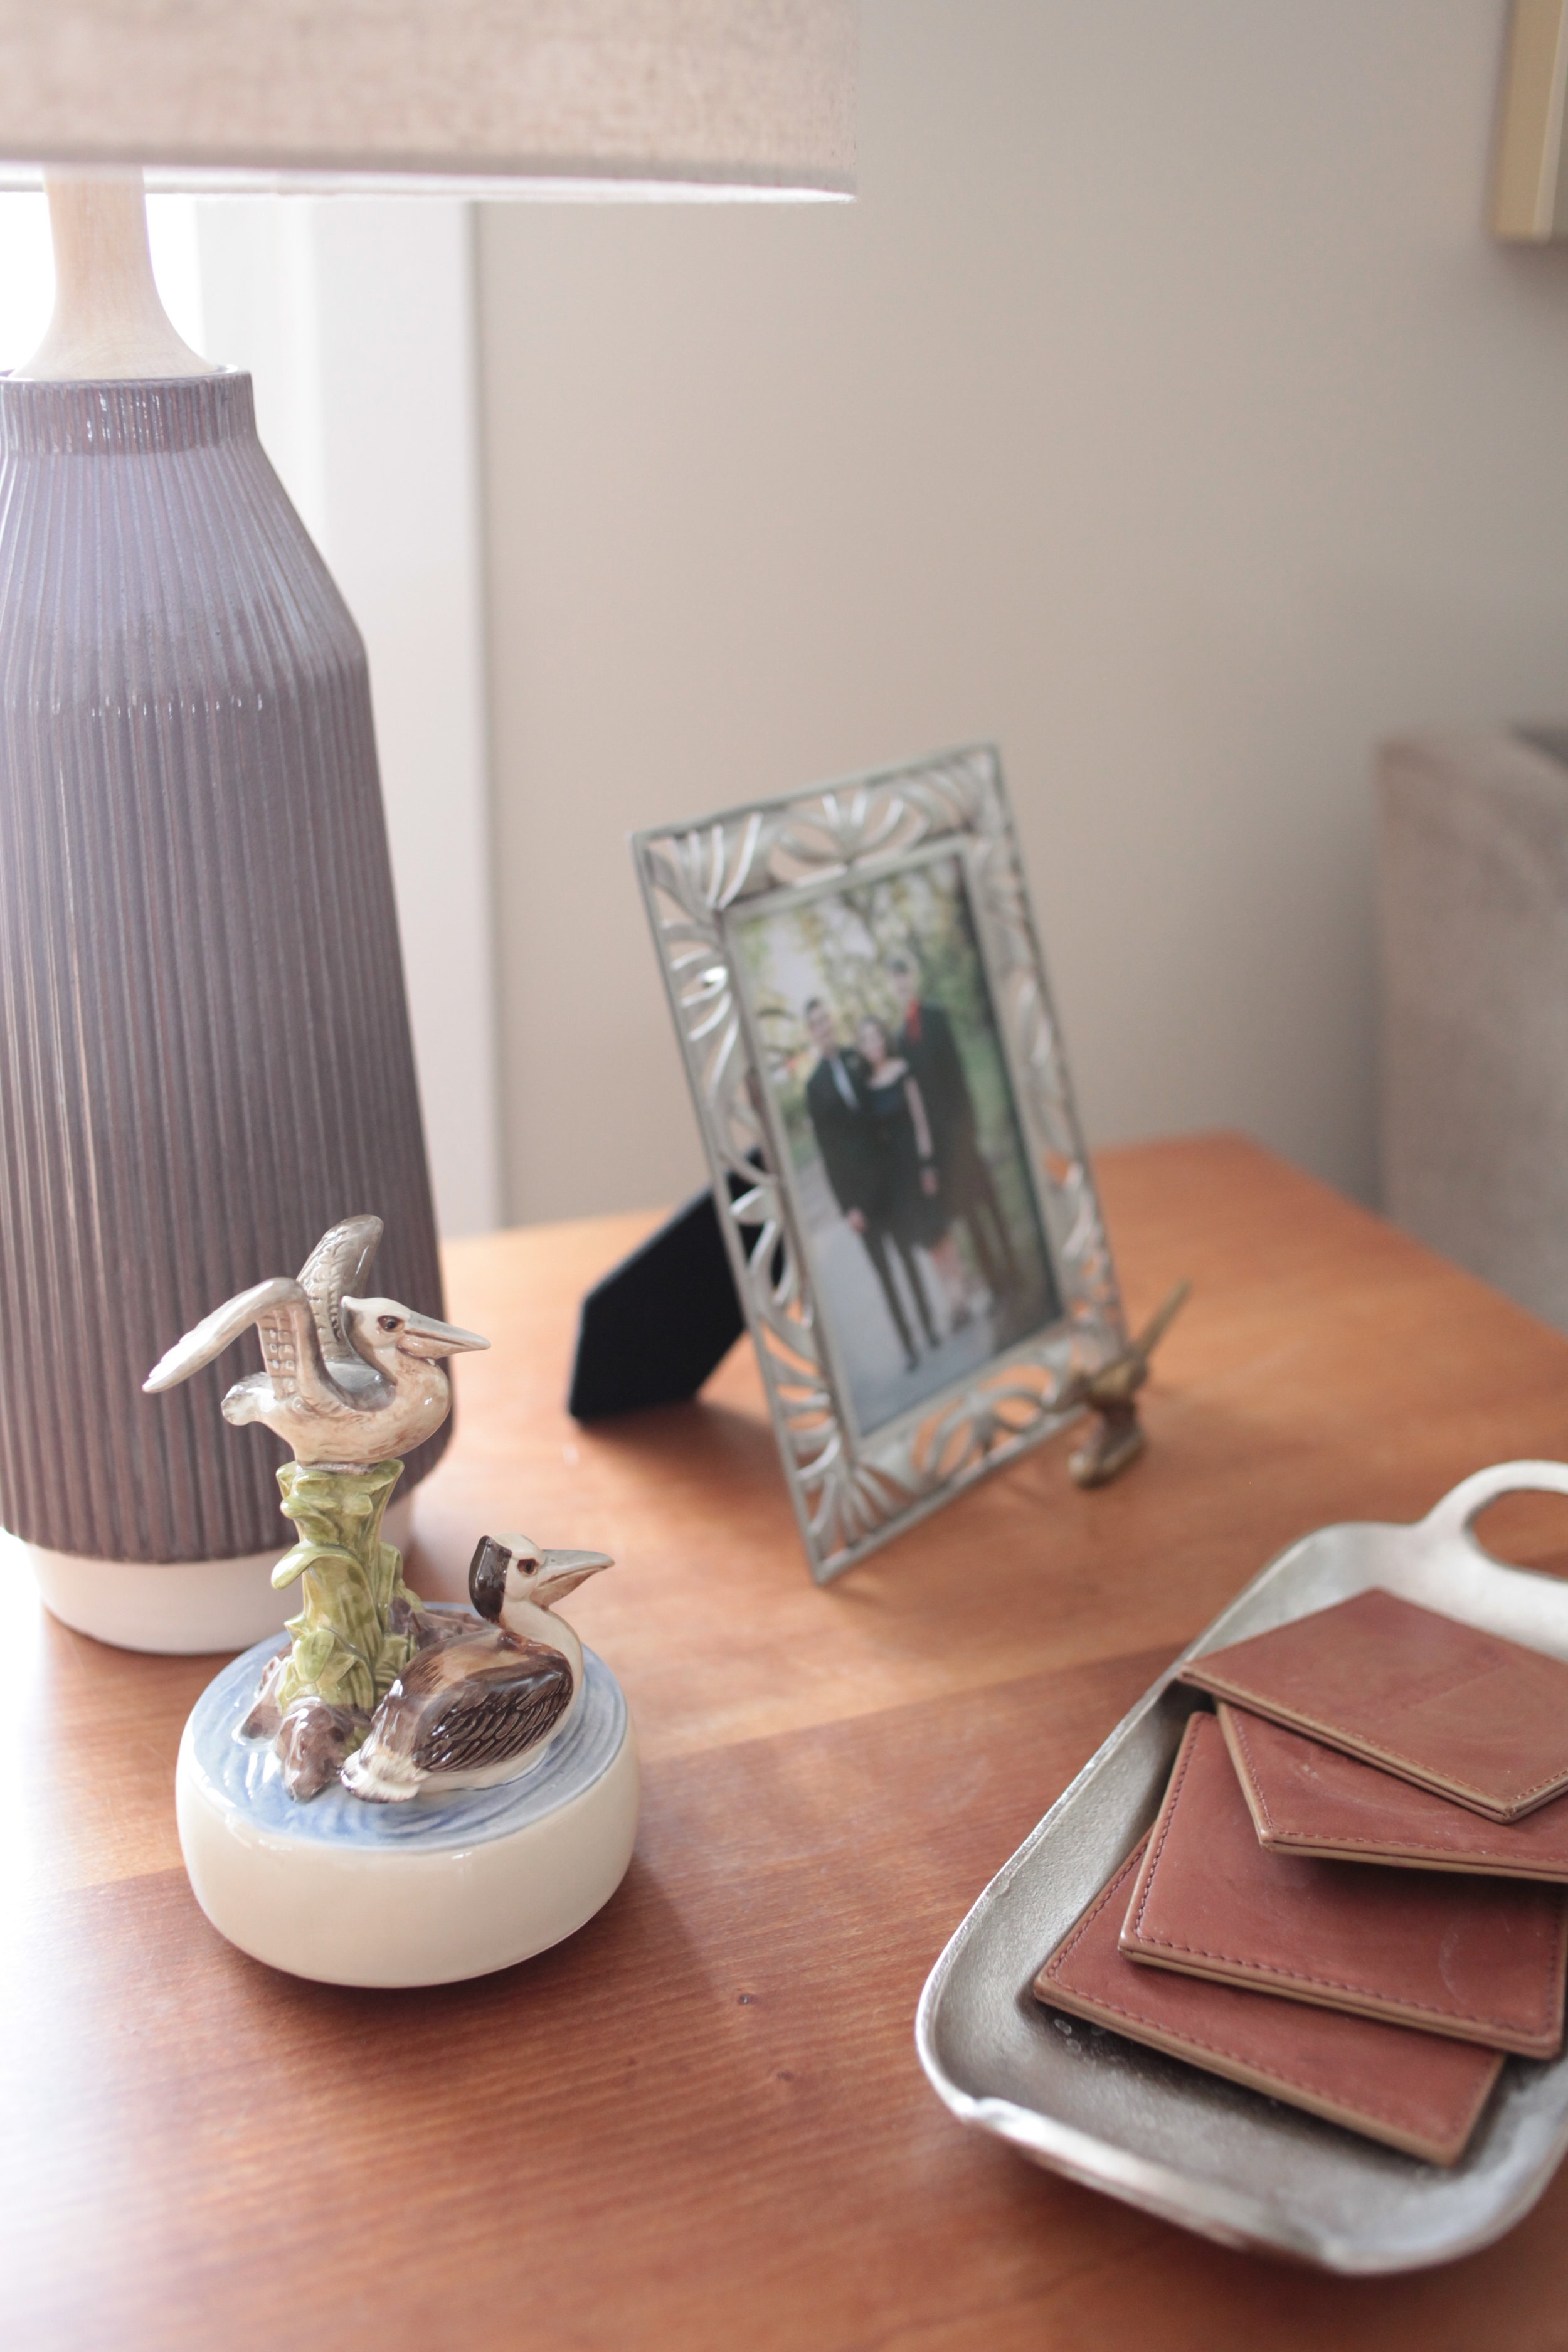 West Elm Roar + Rabbit™ Ripple Ceramic Table Lamp and Silver Tray.JPG